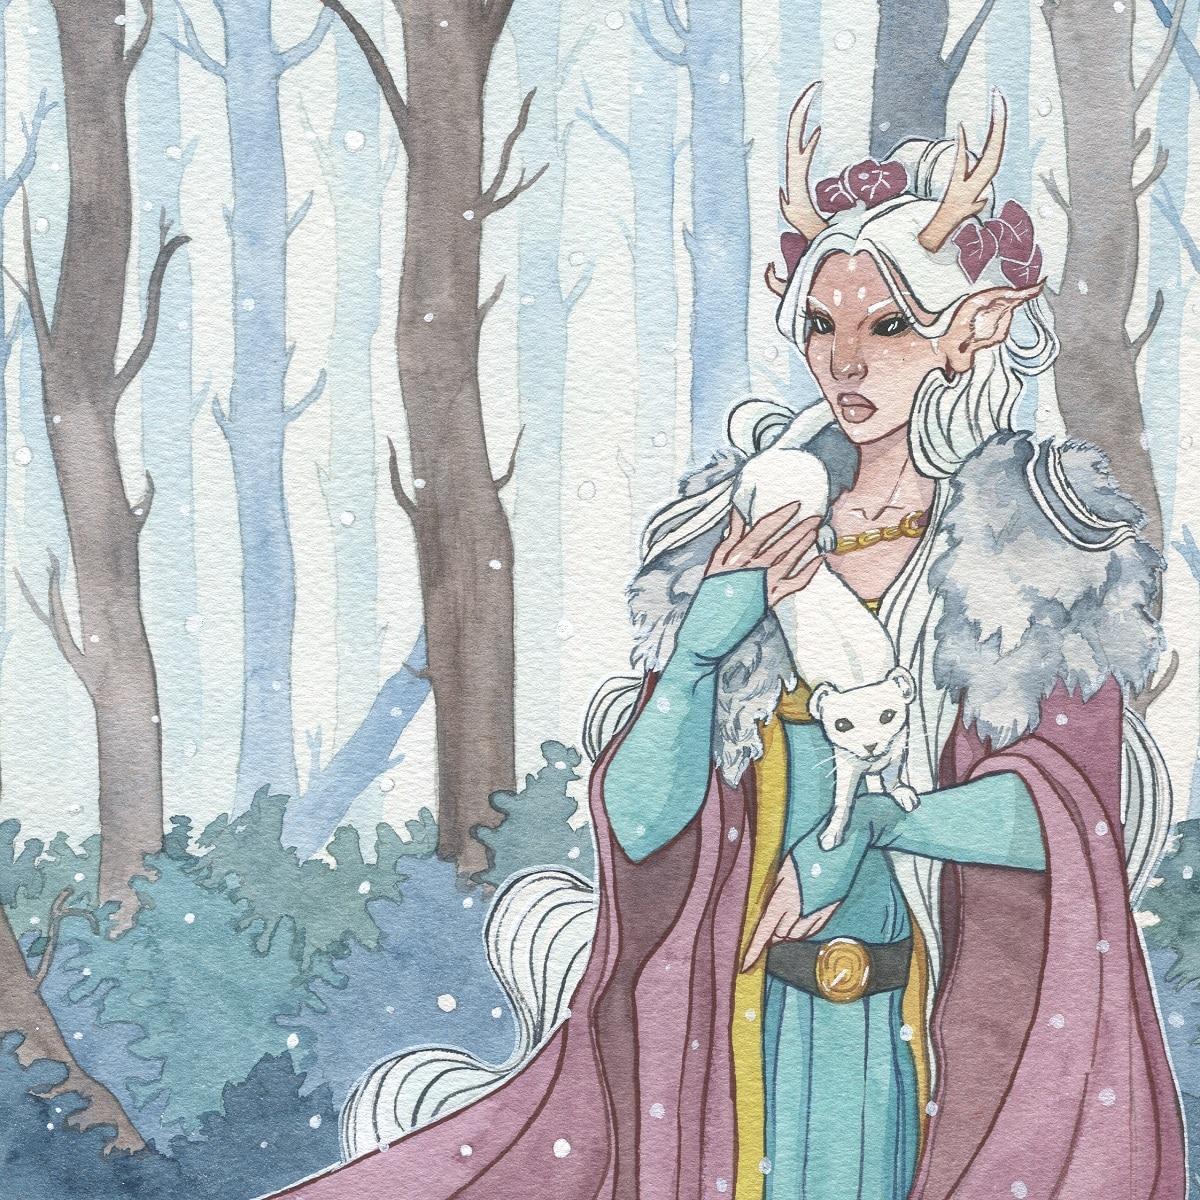 L'esprit de l'hiver - aquarelle originale - aemarielle